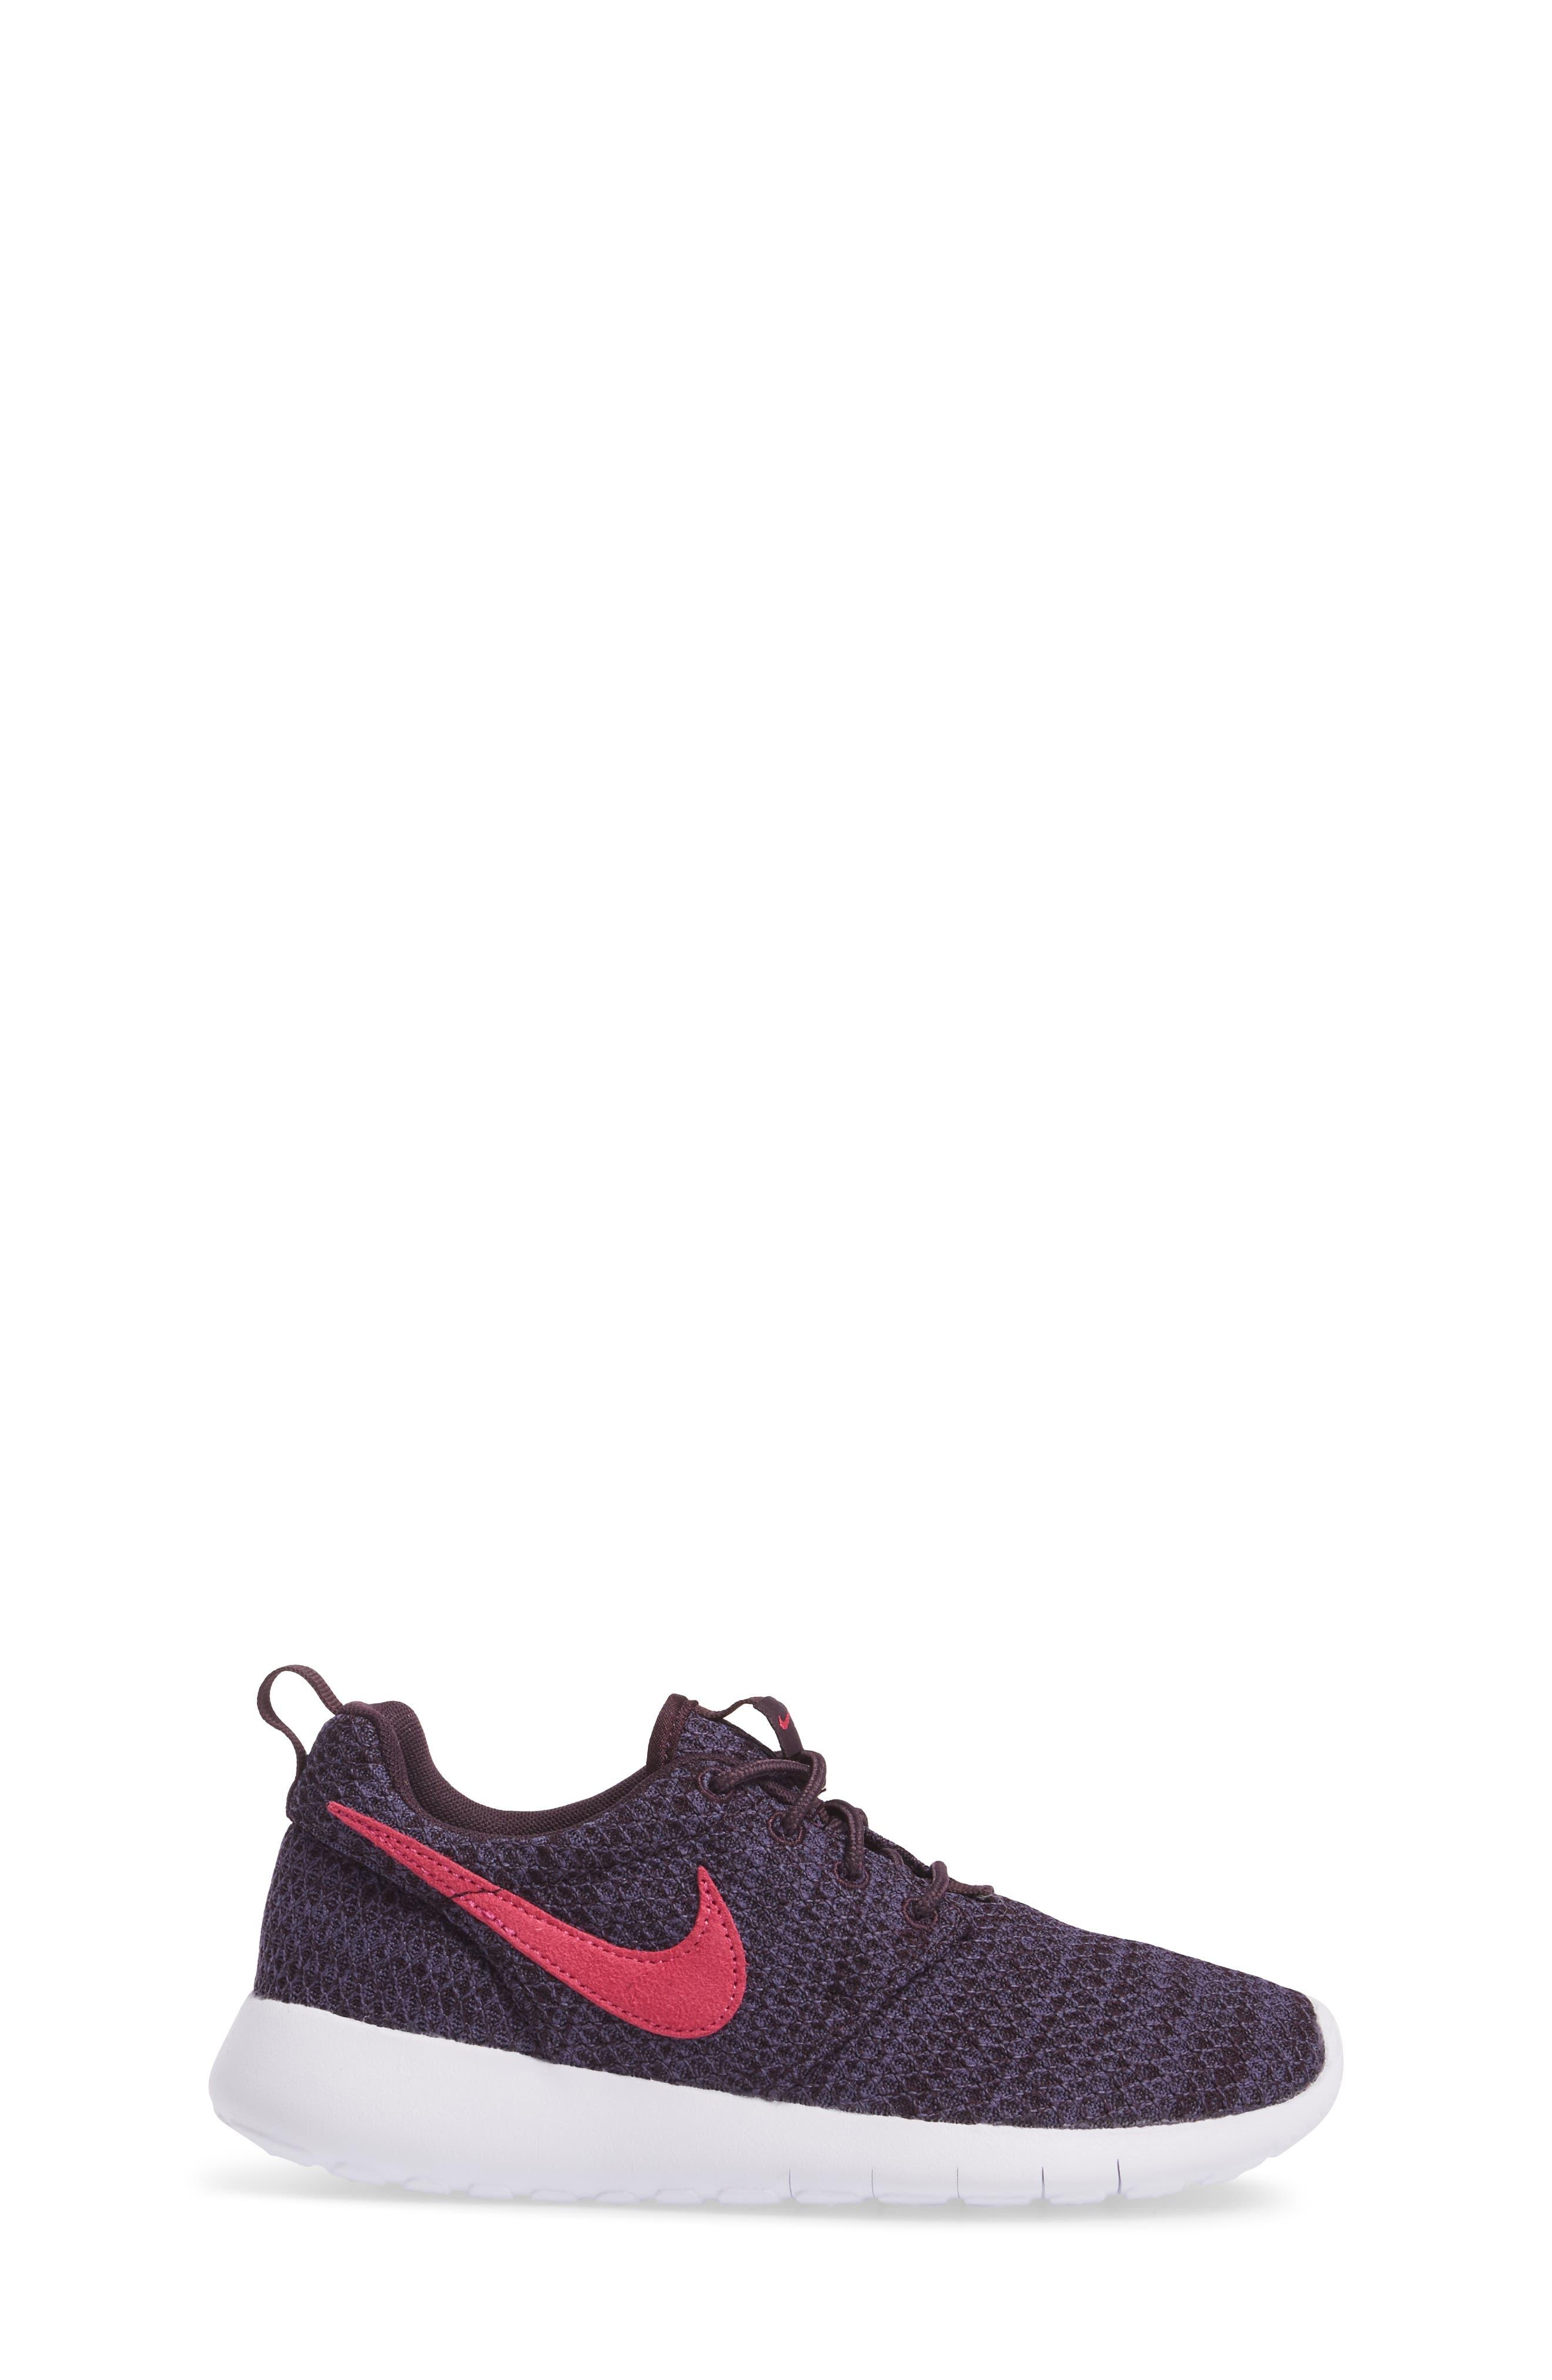 'Roshe Run' Athletic Shoe,                             Alternate thumbnail 149, color,